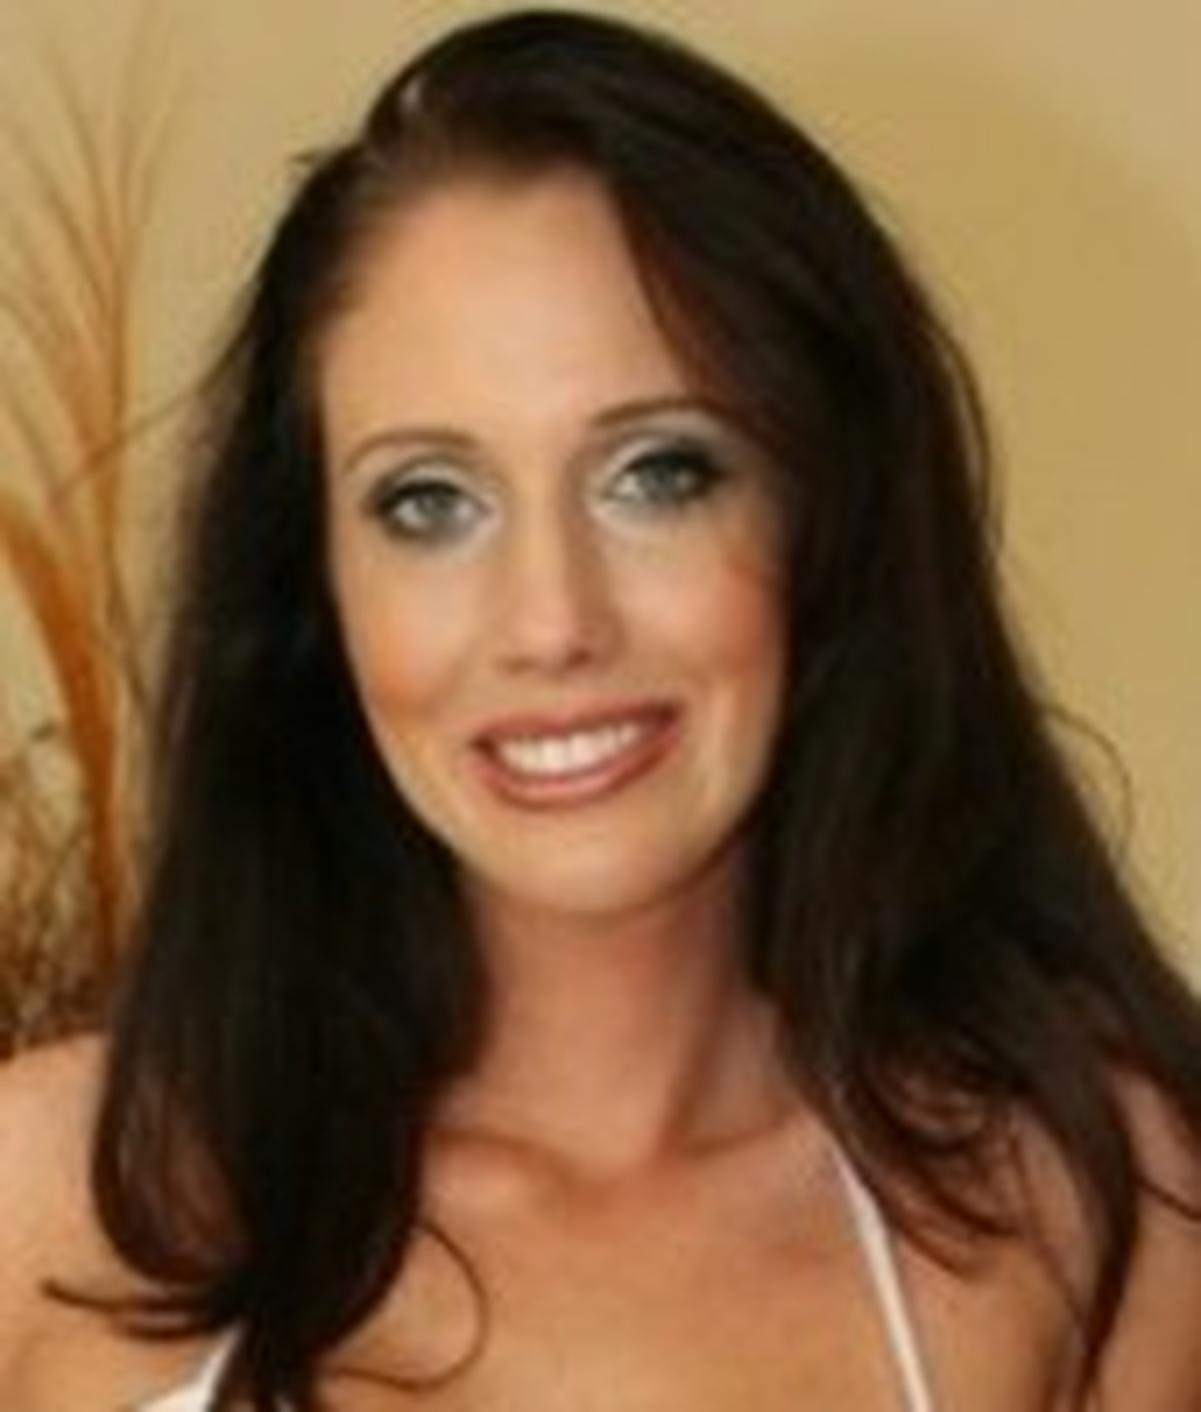 Kimberly Kole Nude Photos 69